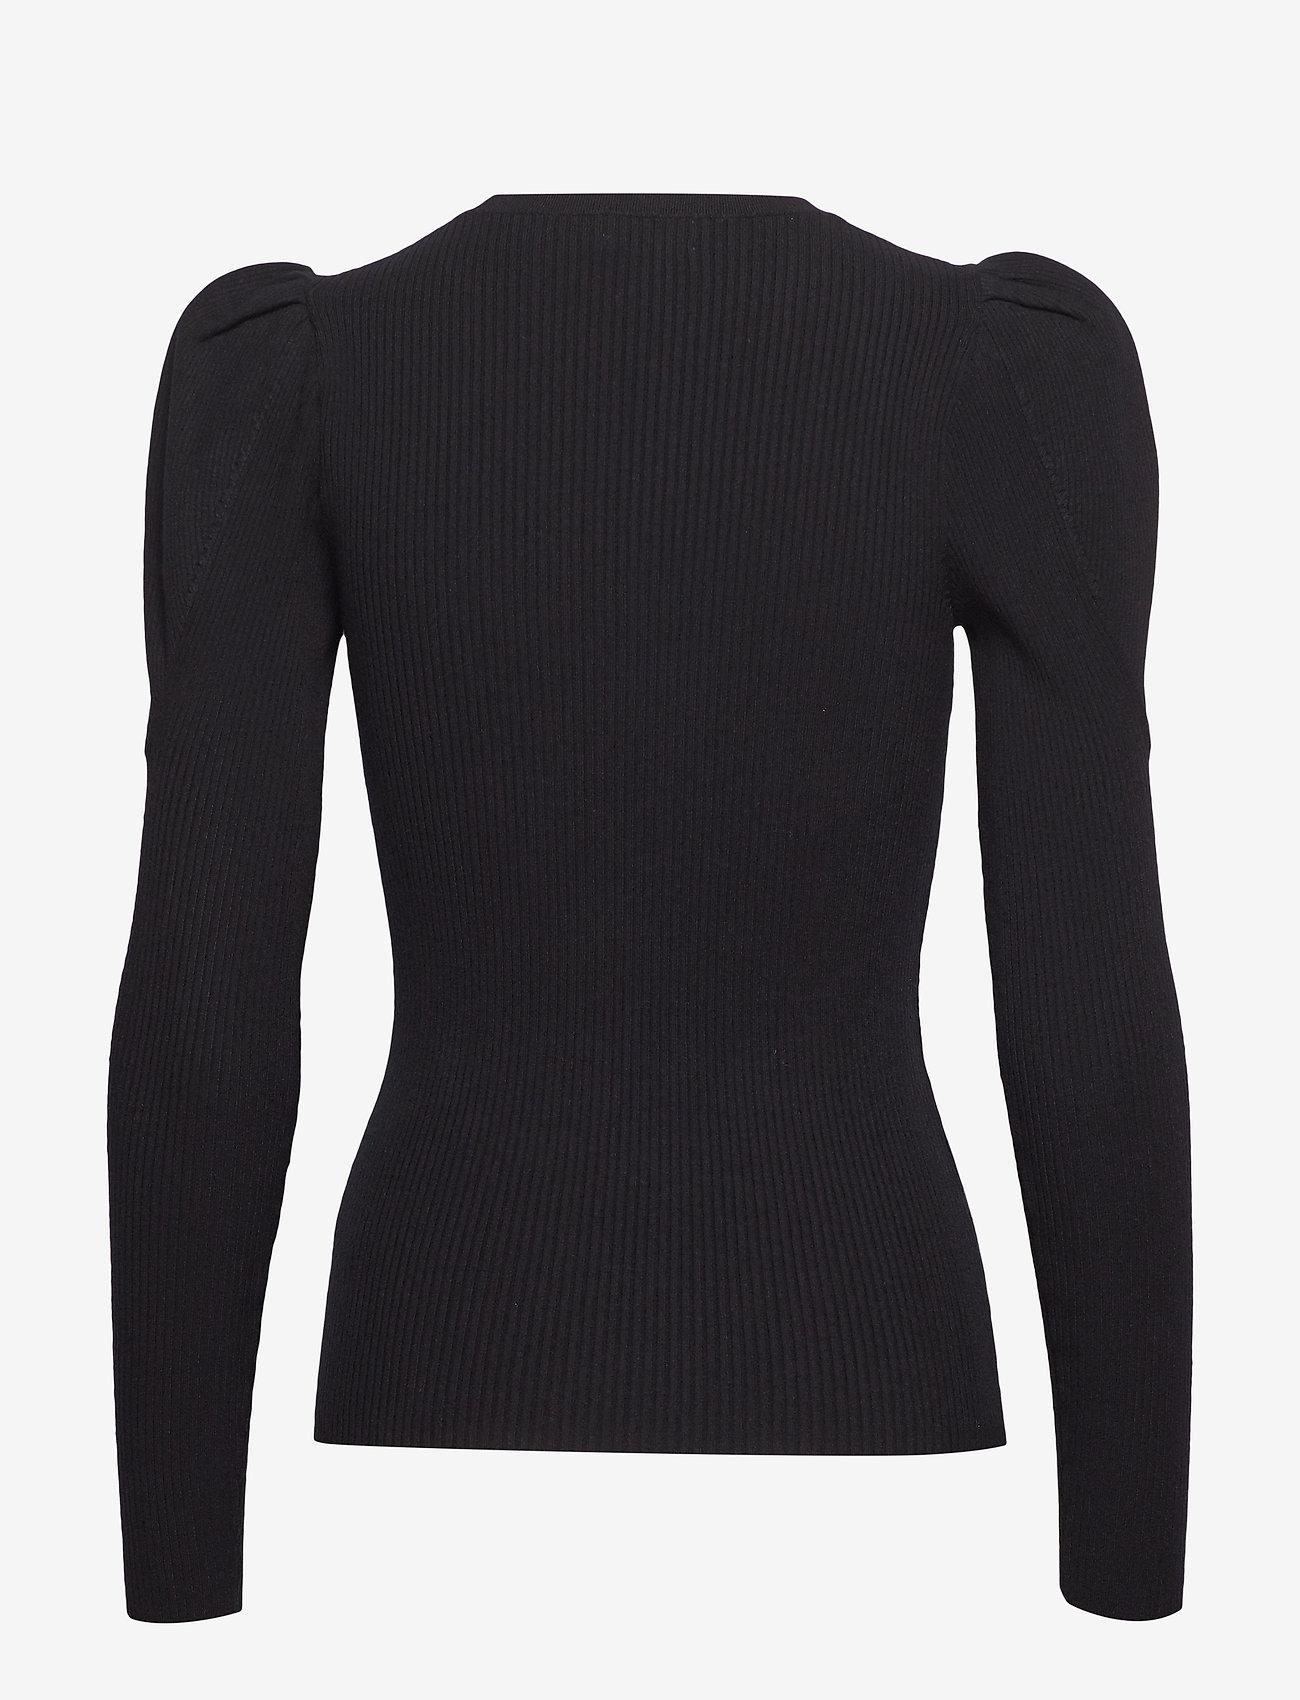 Viscose Blend-lsl-swt (Polo Black) (959.40 kr) - Polo Ralph Lauren